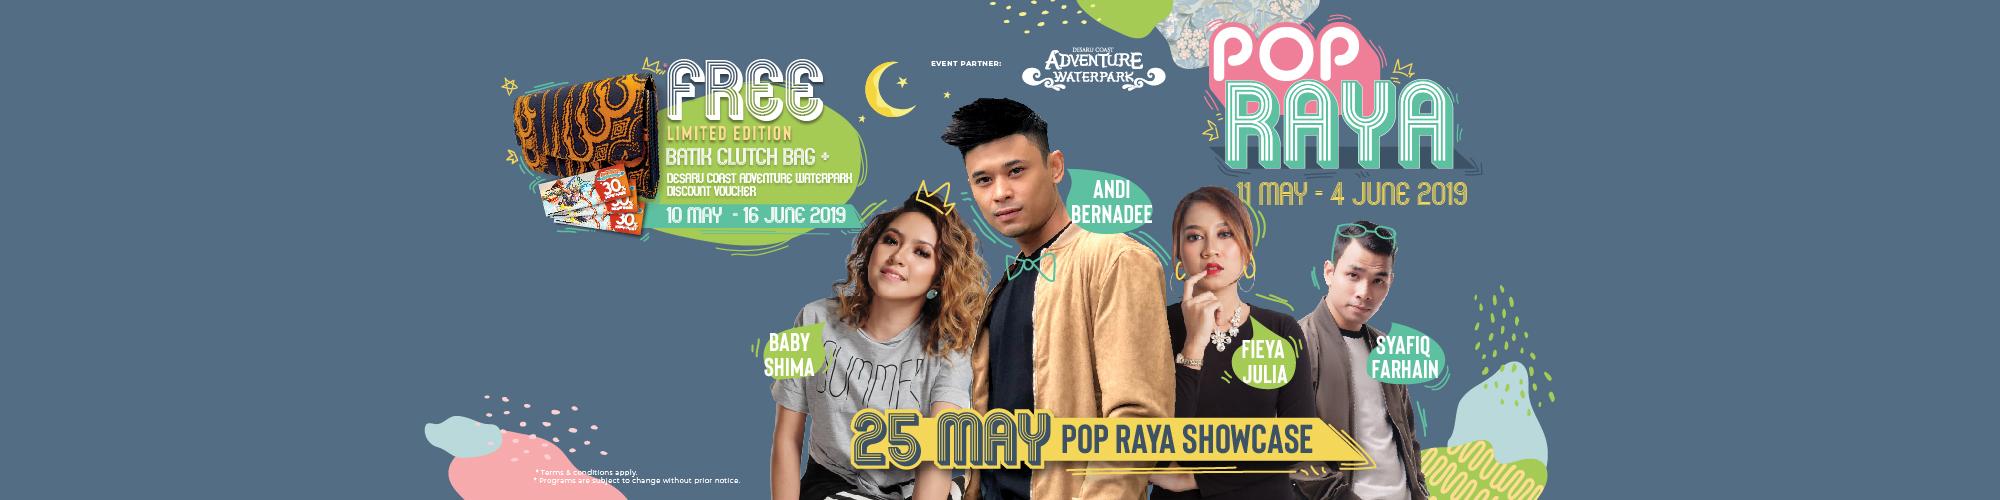 pop_raya_2019_web_slider-01